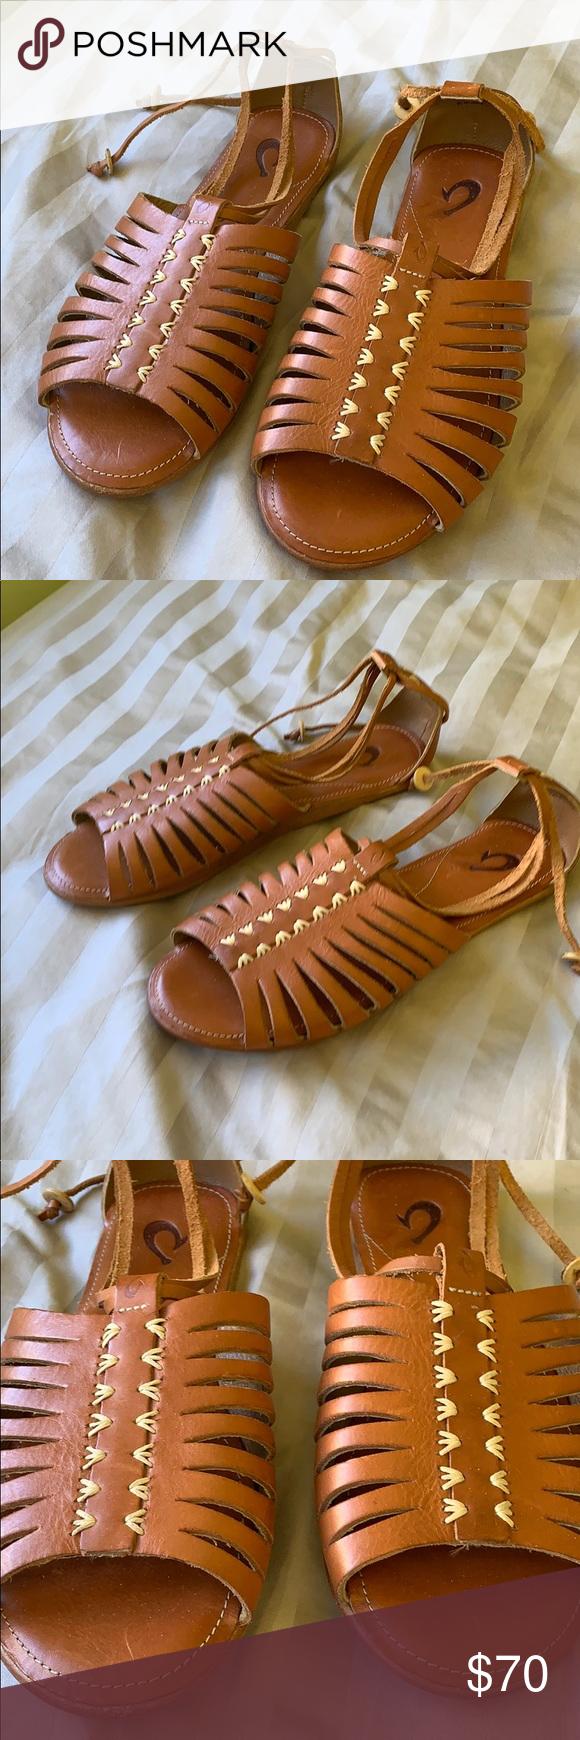 NWT Olukai Woven Amber Tan Ginger Sandals Tan ginger